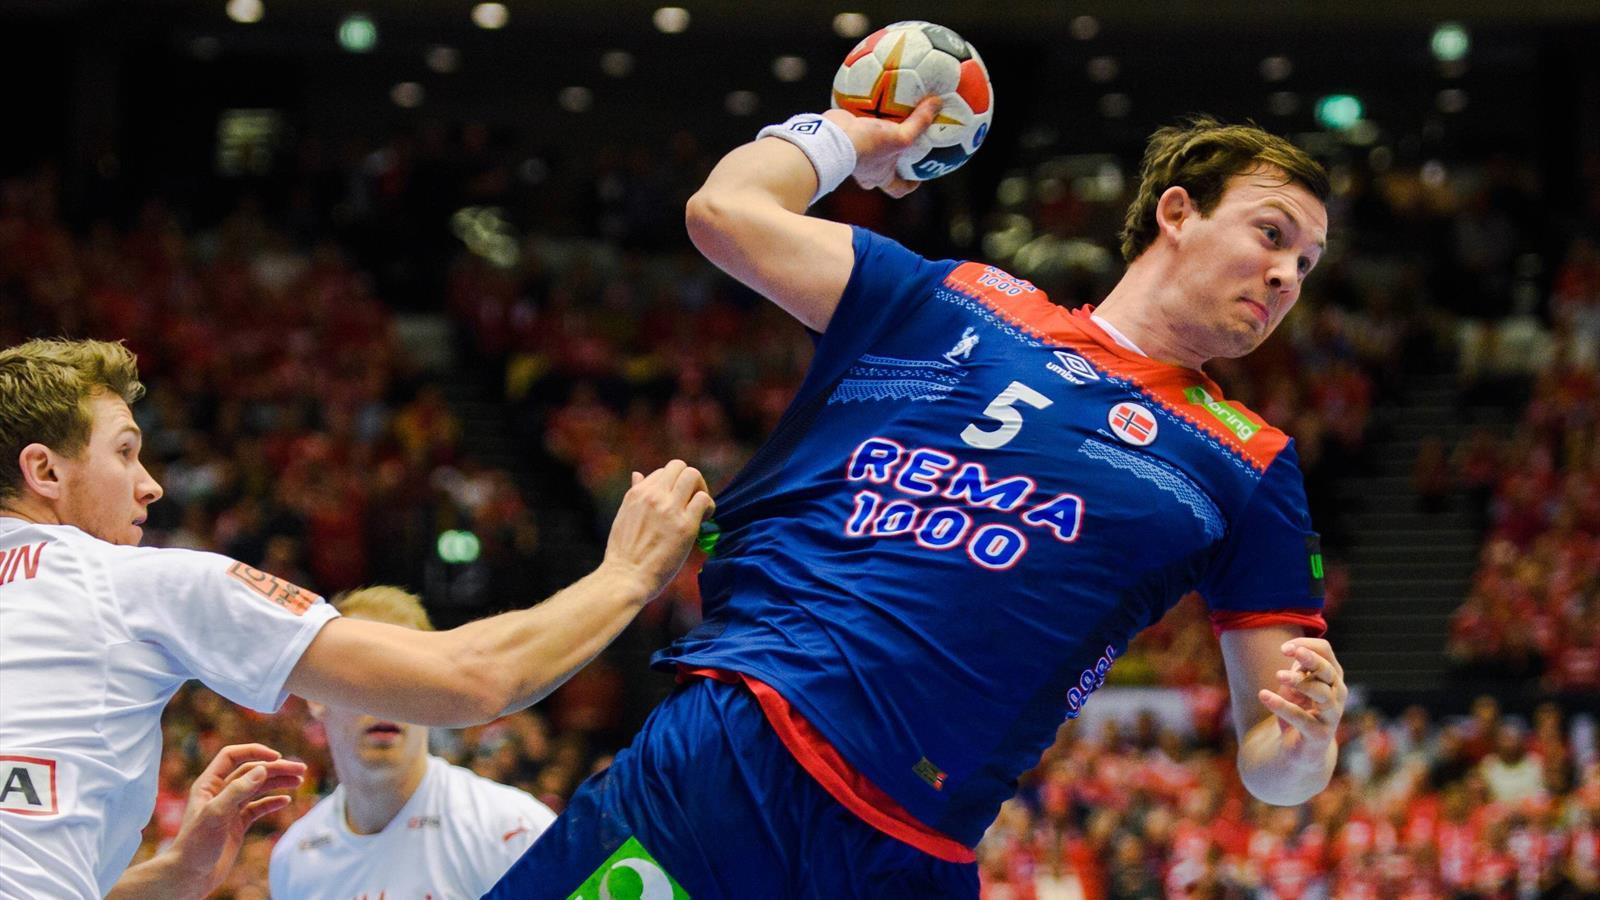 Handball Wm 2019 Im Tv